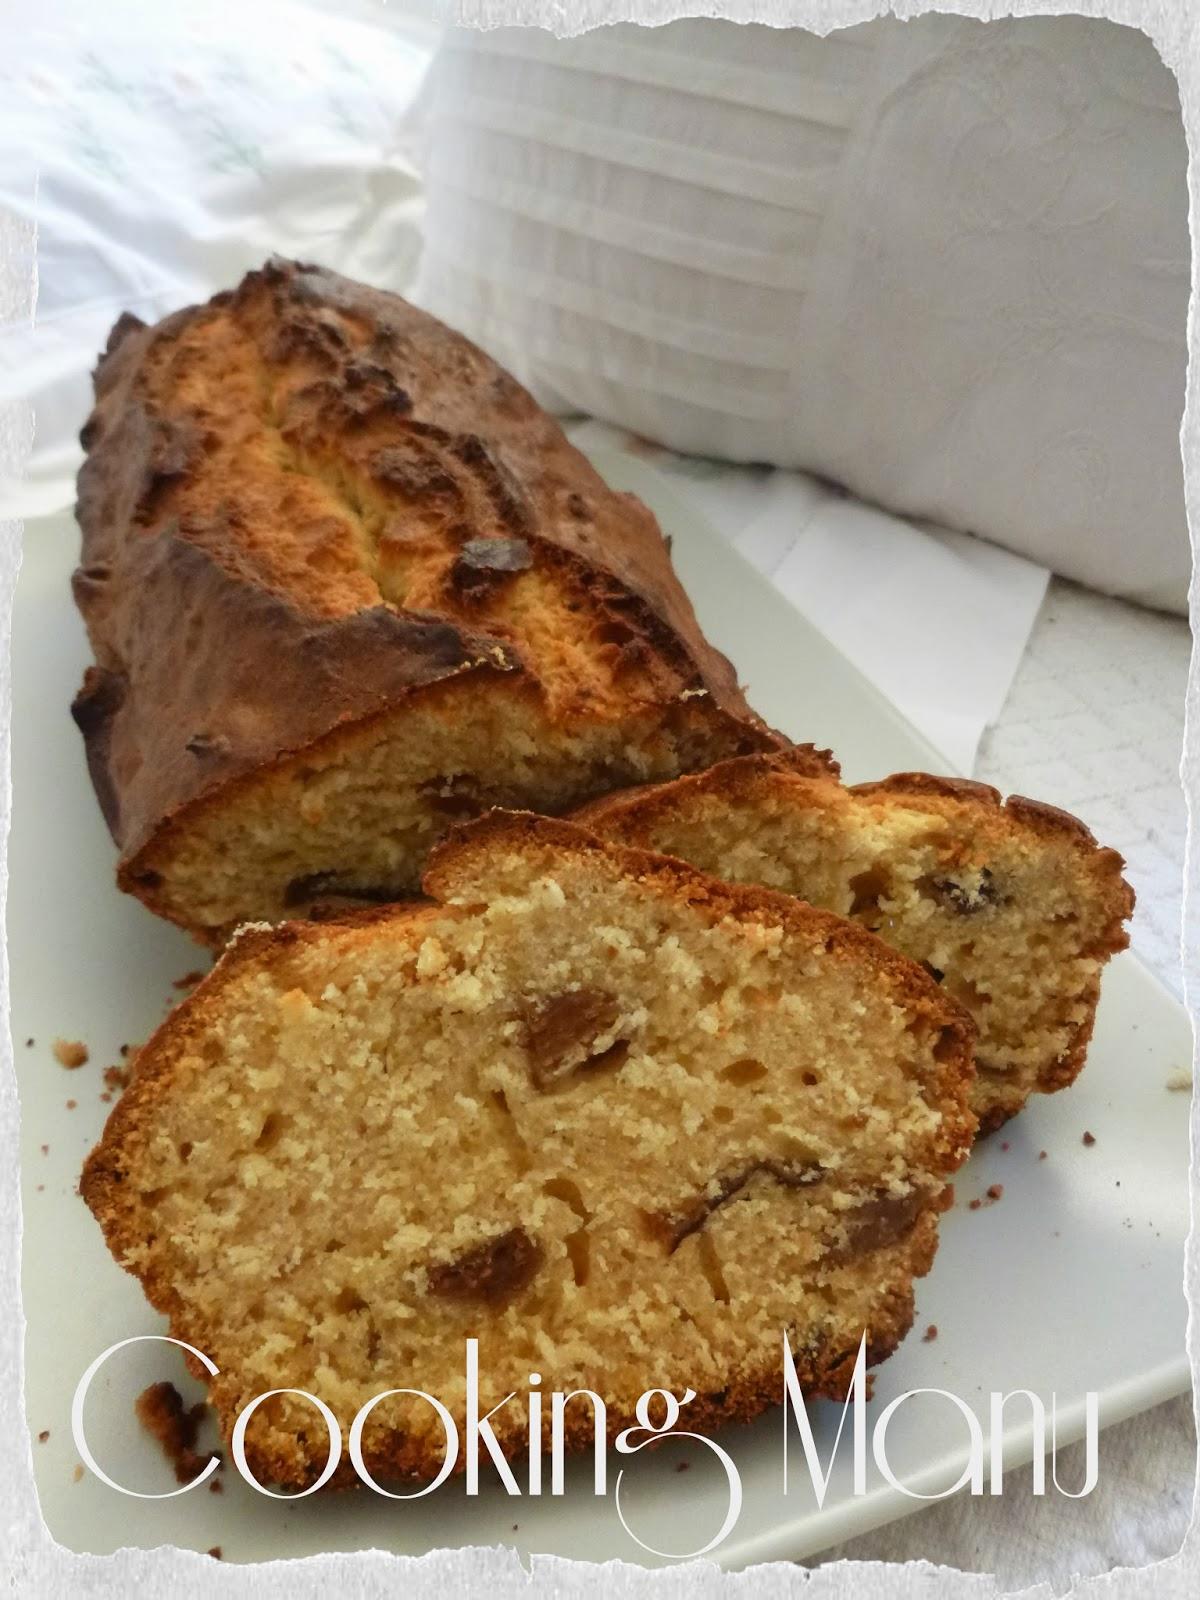 pasta di pane dolce (sweet bread dough)